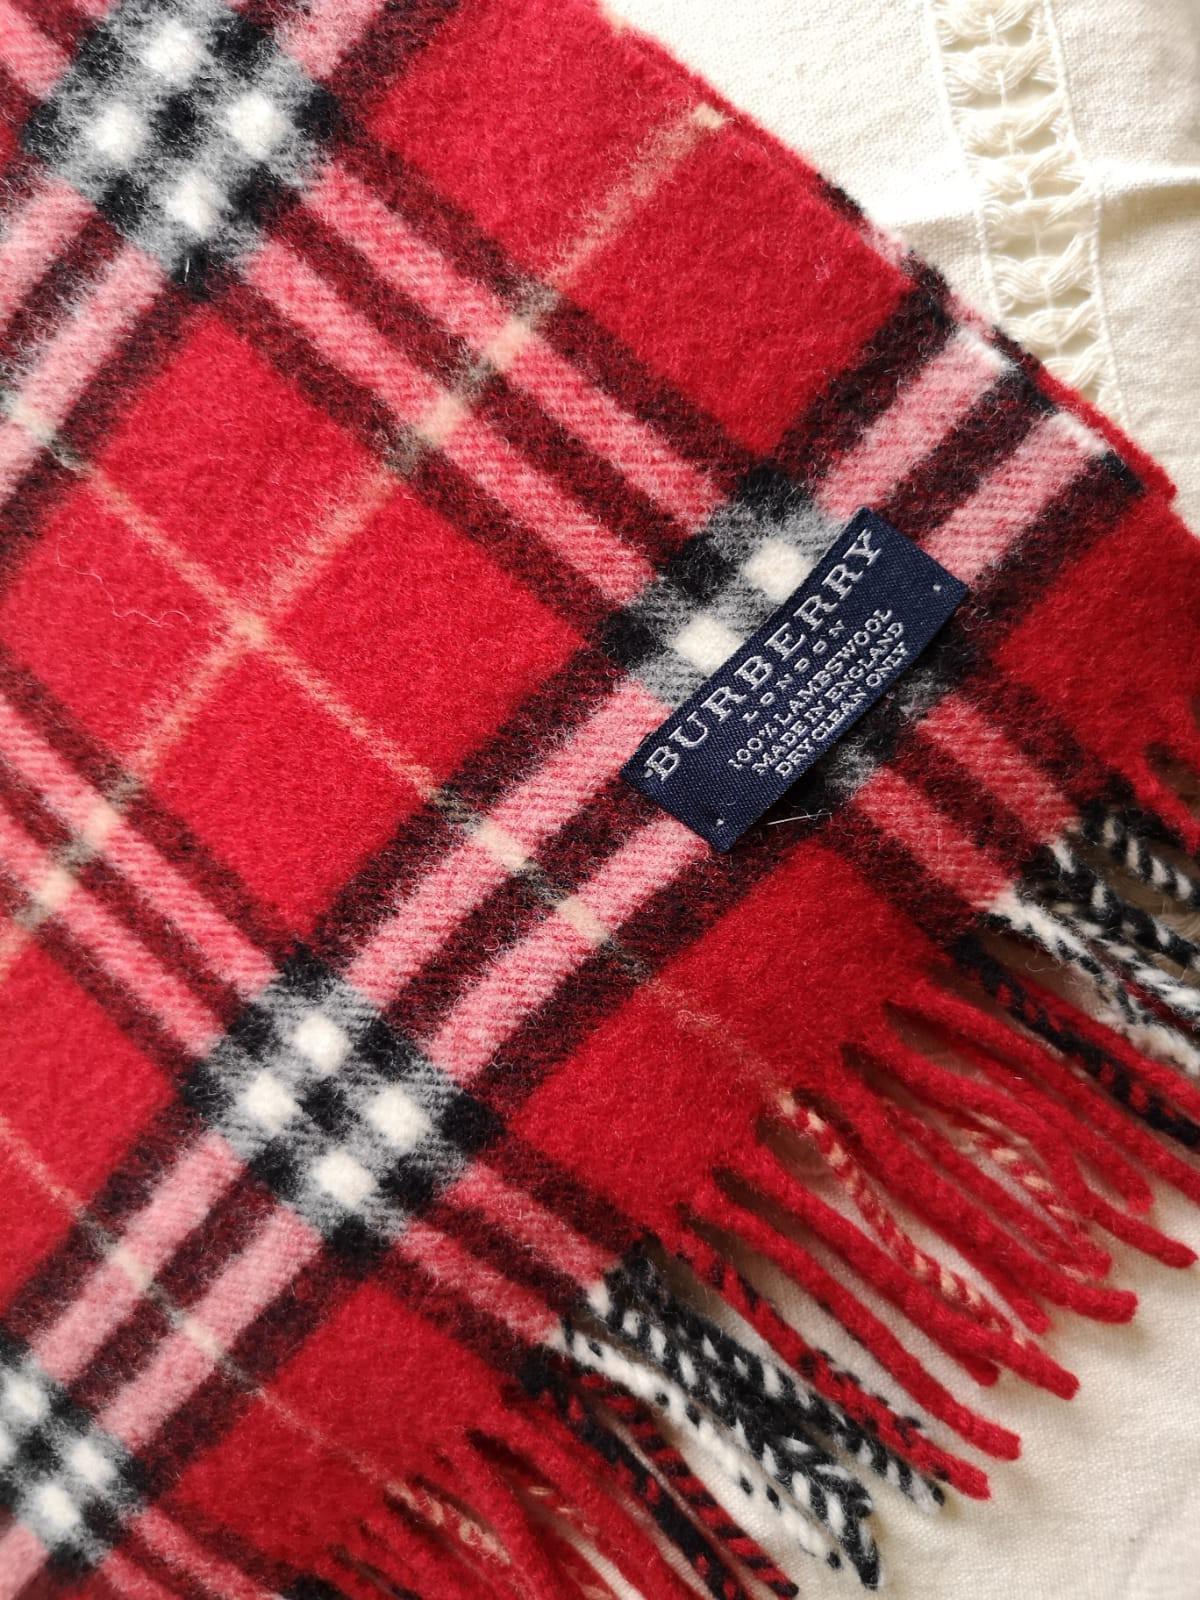 (特長)Burberry Vintage Scarf 頸巾圍巾